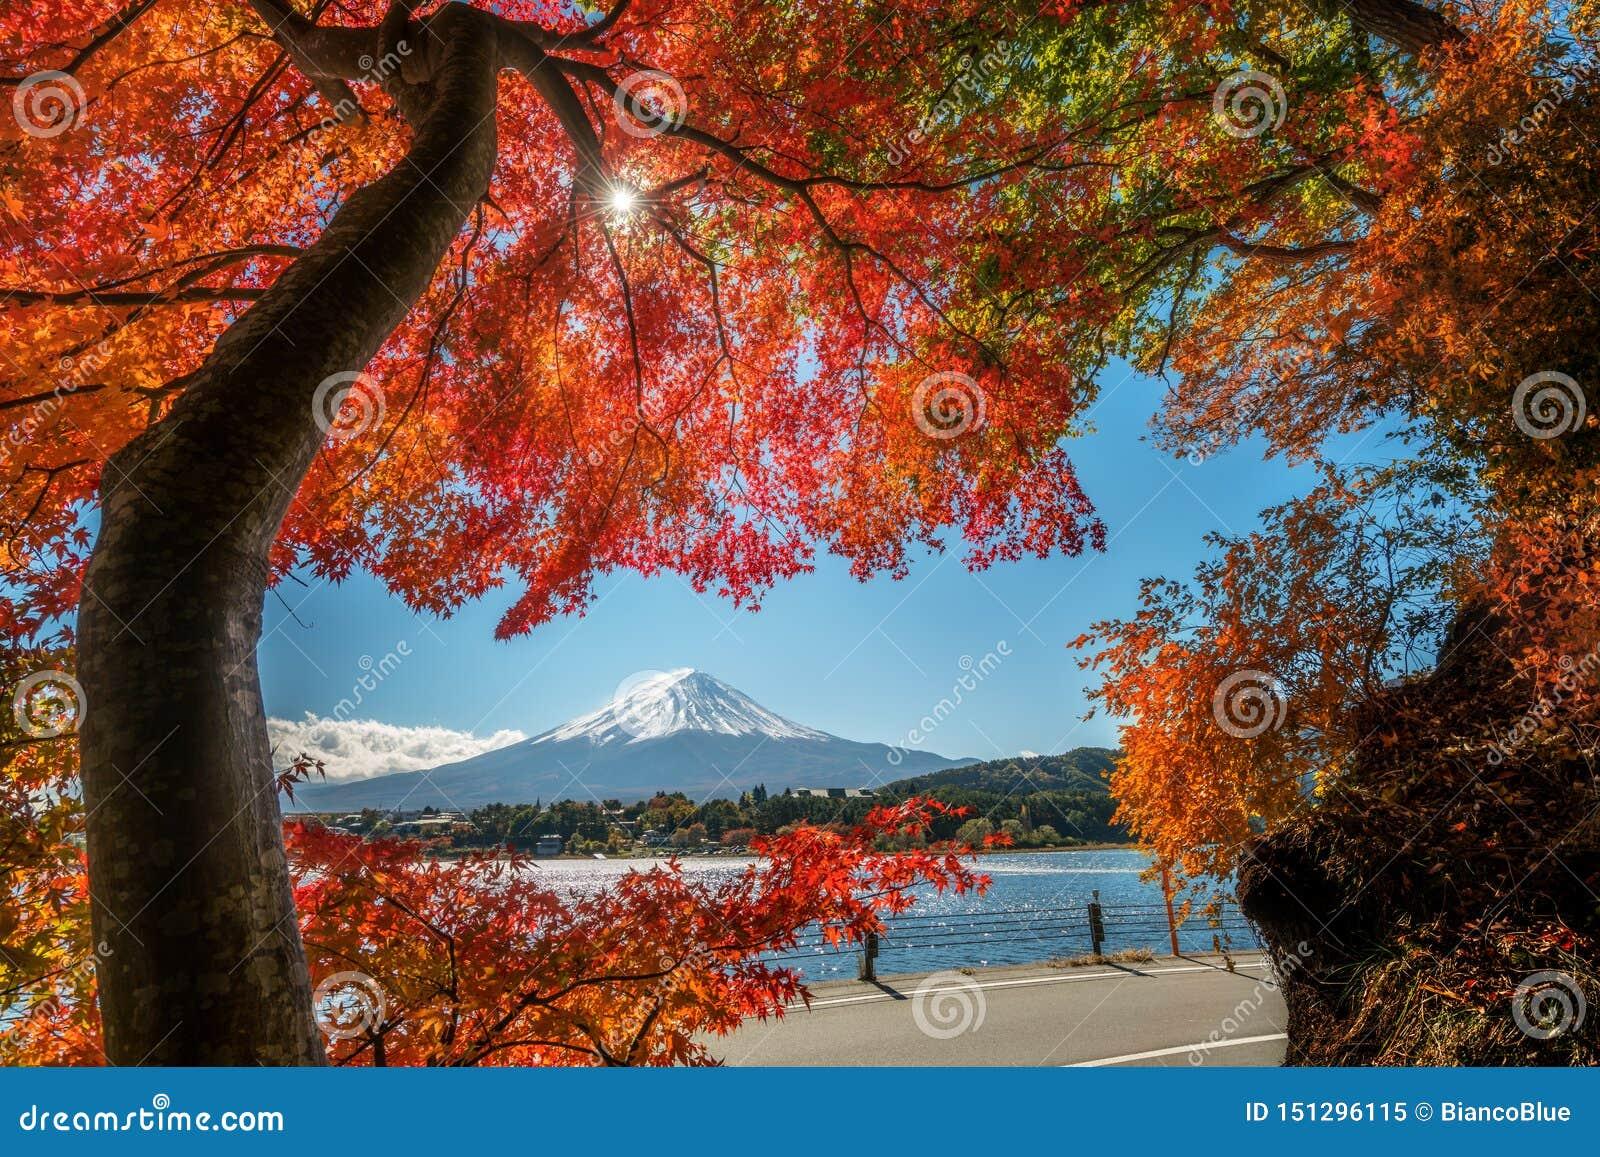 Der Fujisan in Autumn Color, Japan